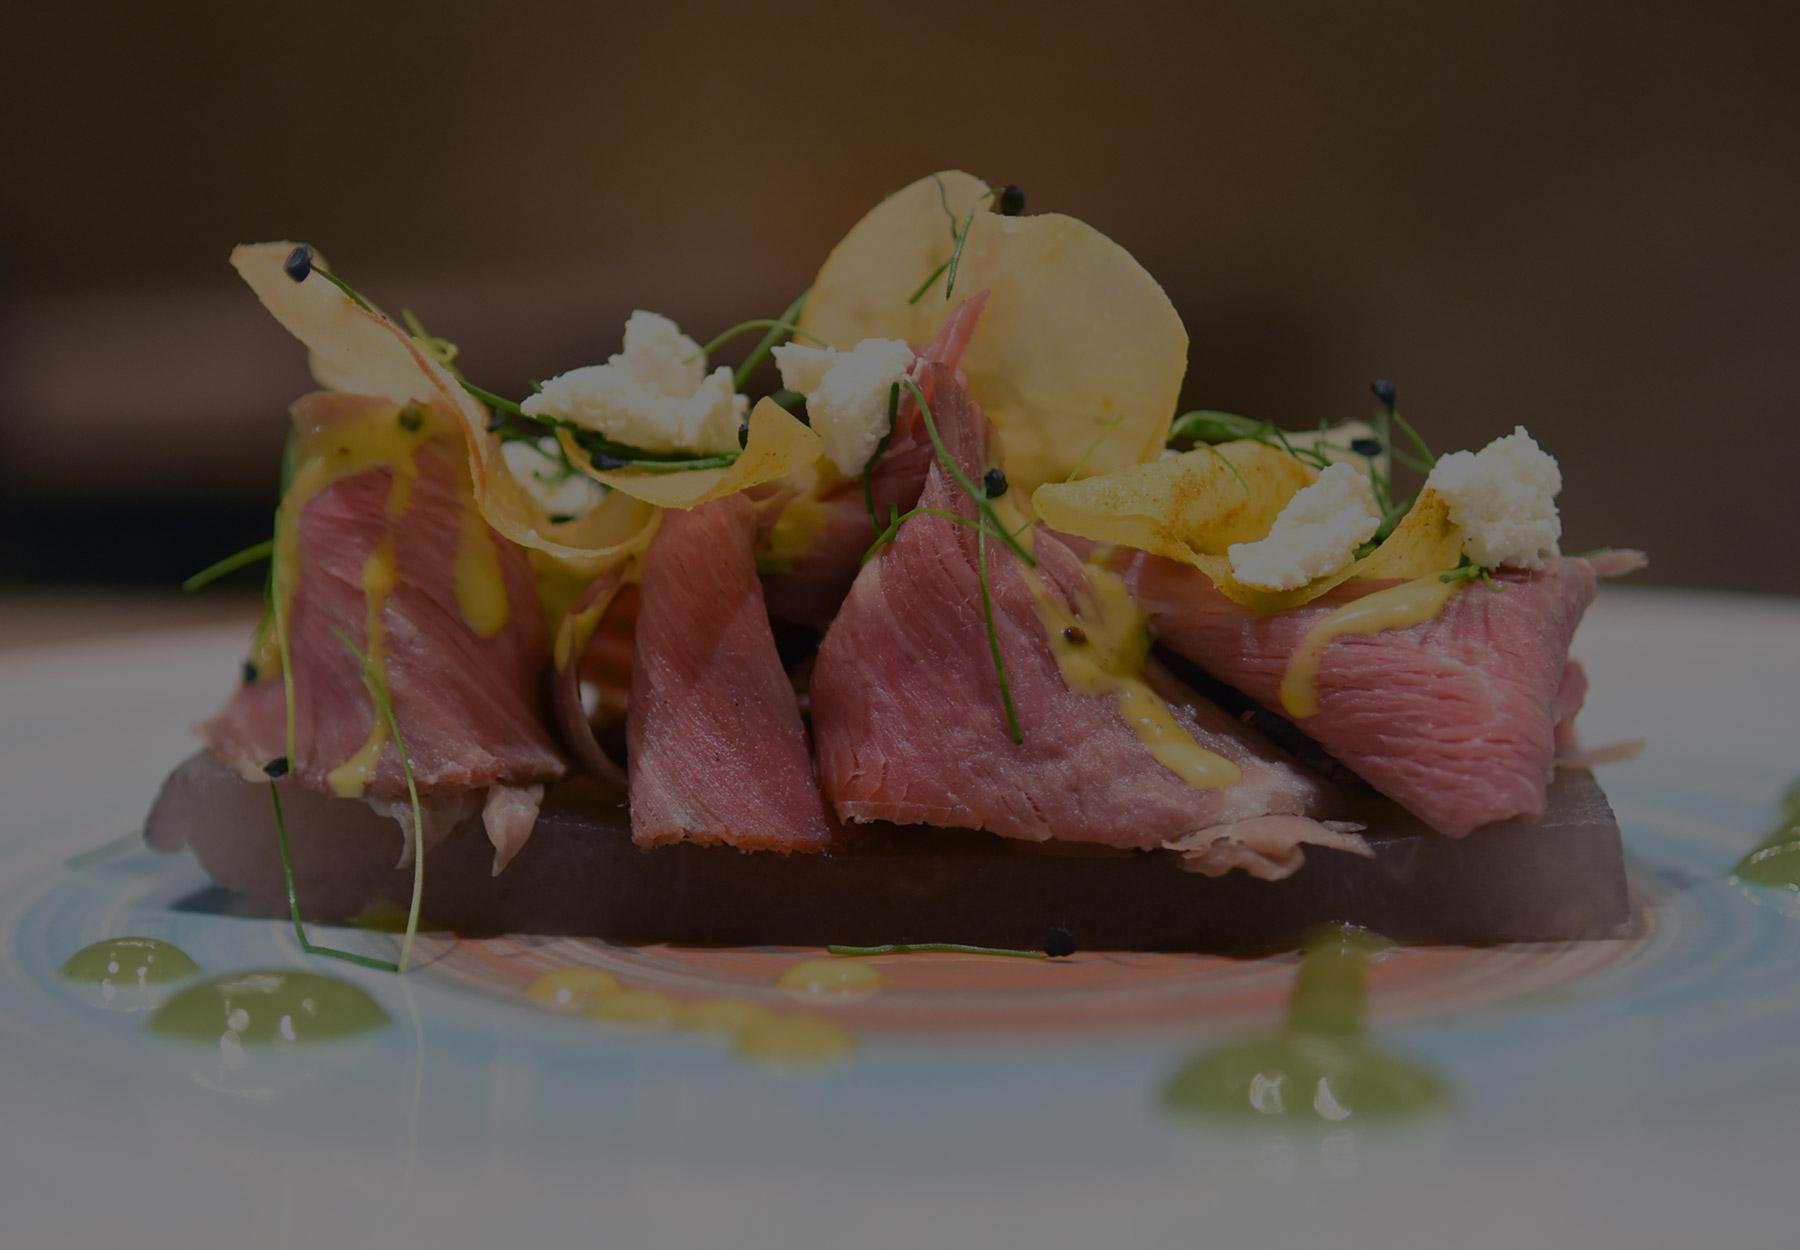 Plato de cocina creativa en Pamplona